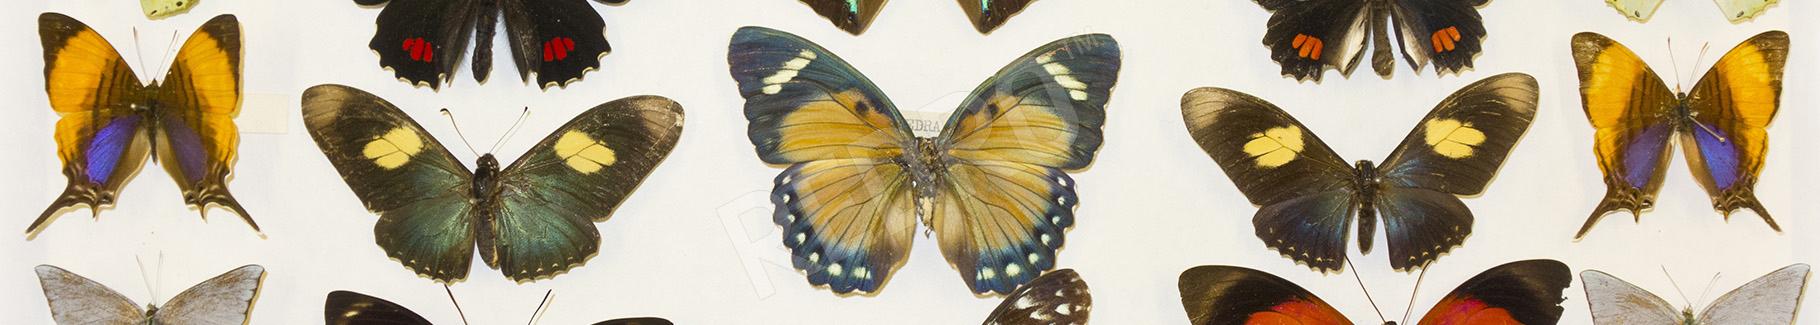 Obraz gatunki motyli